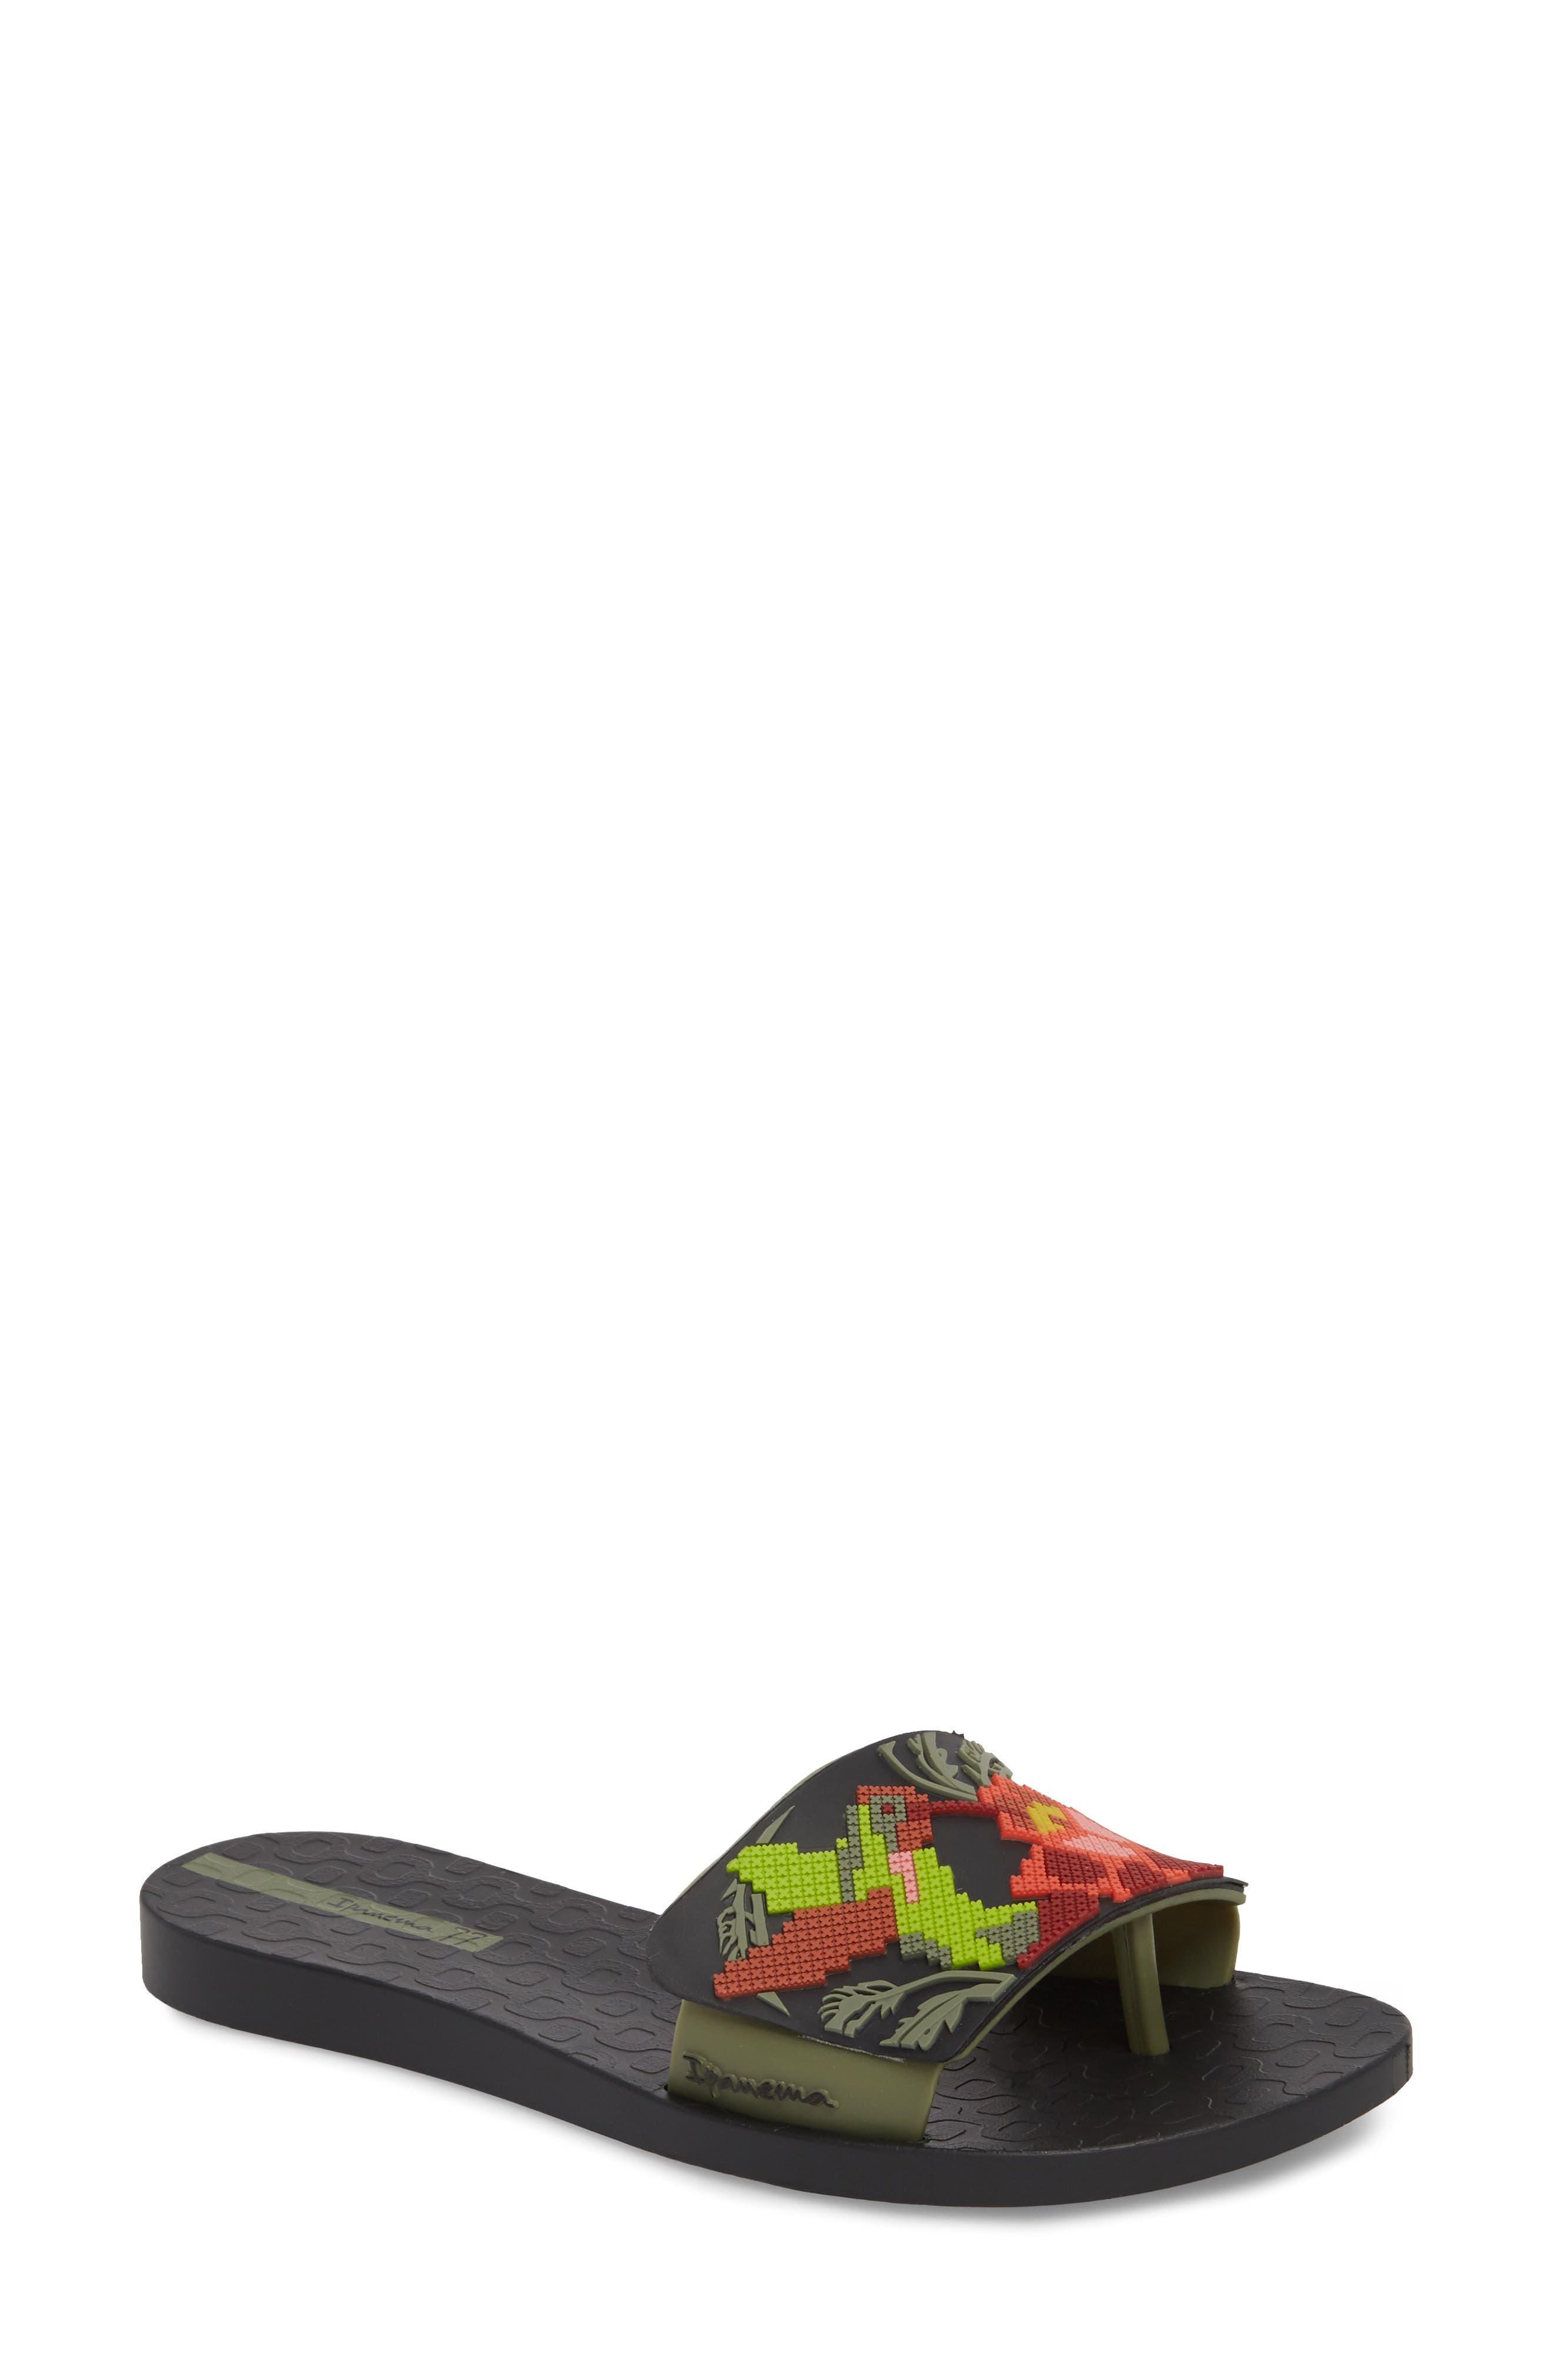 Ipanema Nectar Floral Slide Sandal (Women)